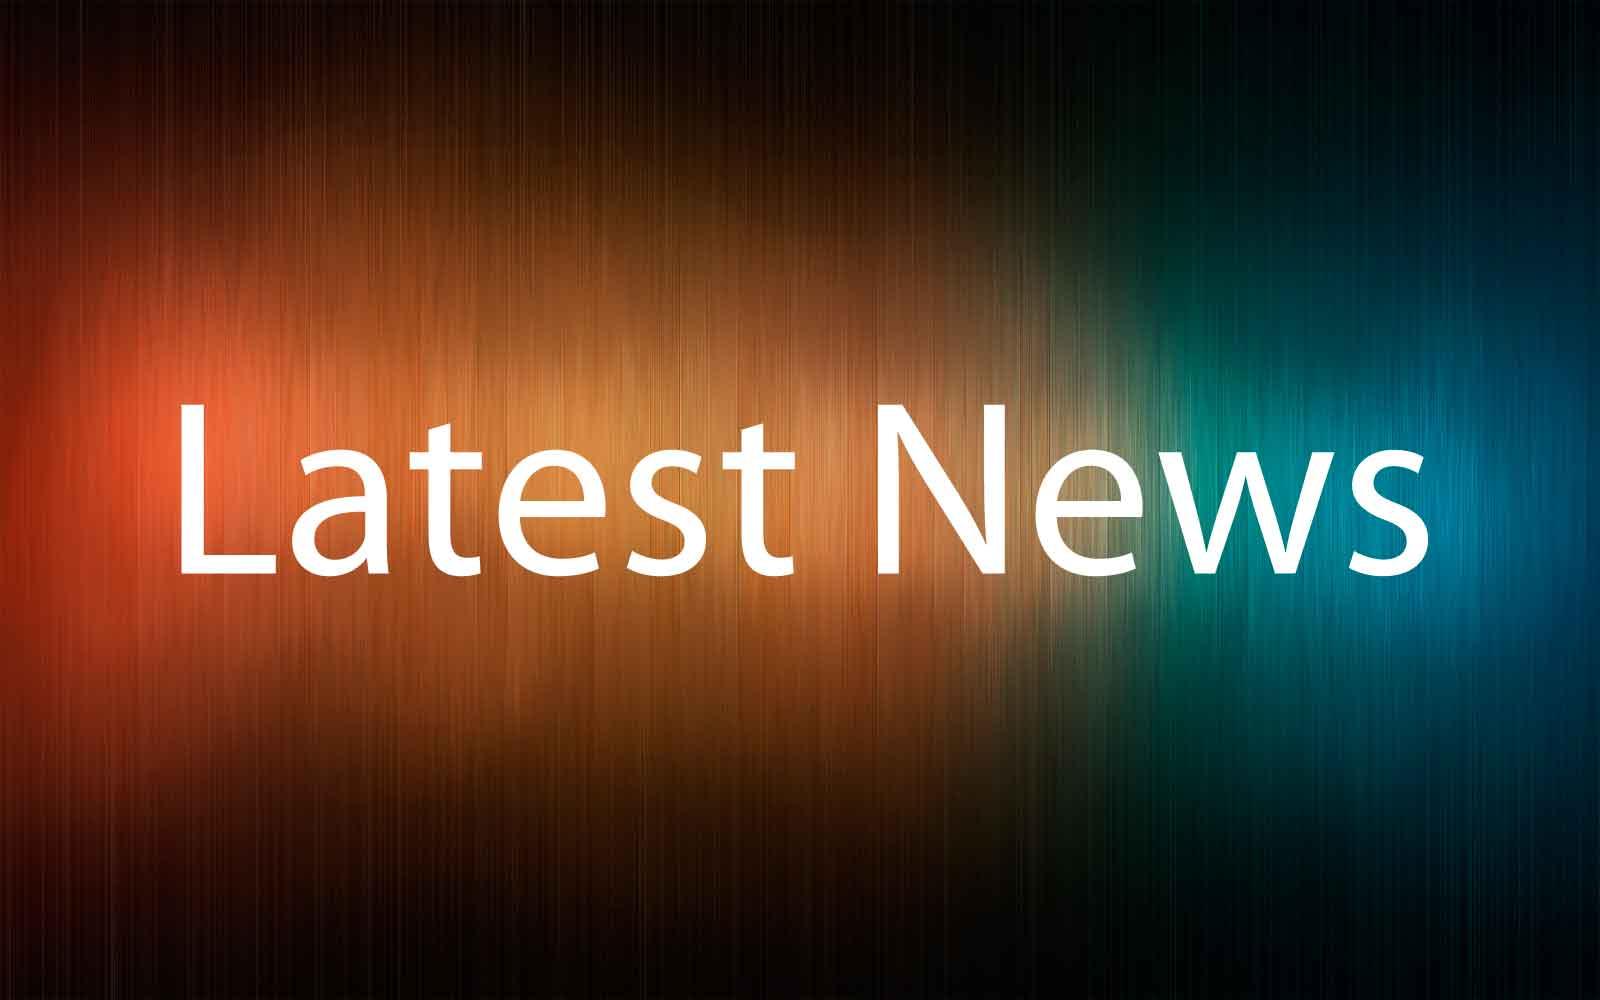 Latest News!